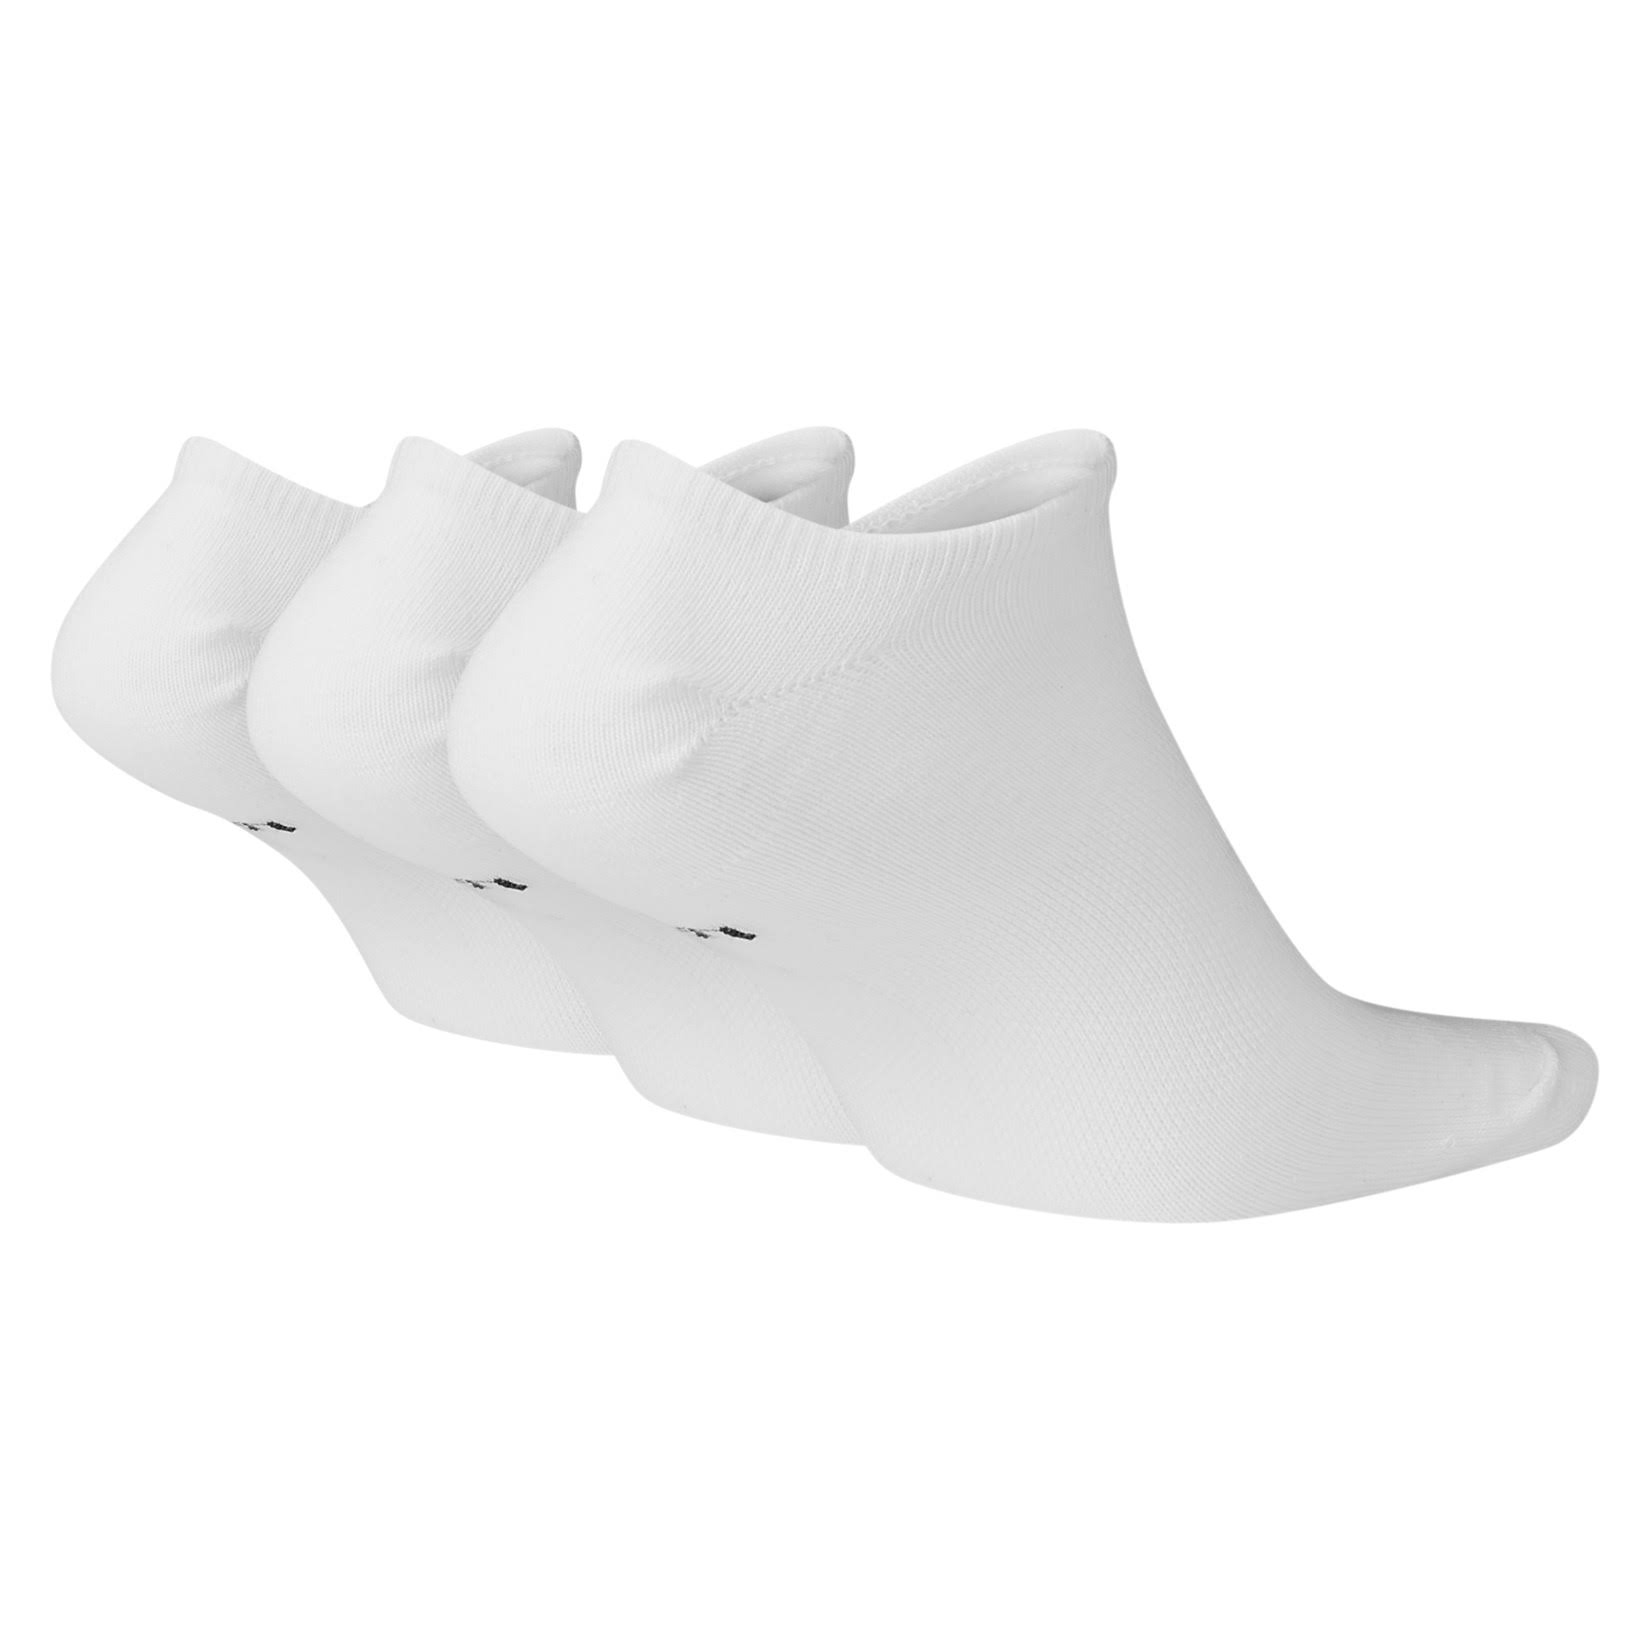 Nike Sportswear Everyday Essential No Show Socks White Black